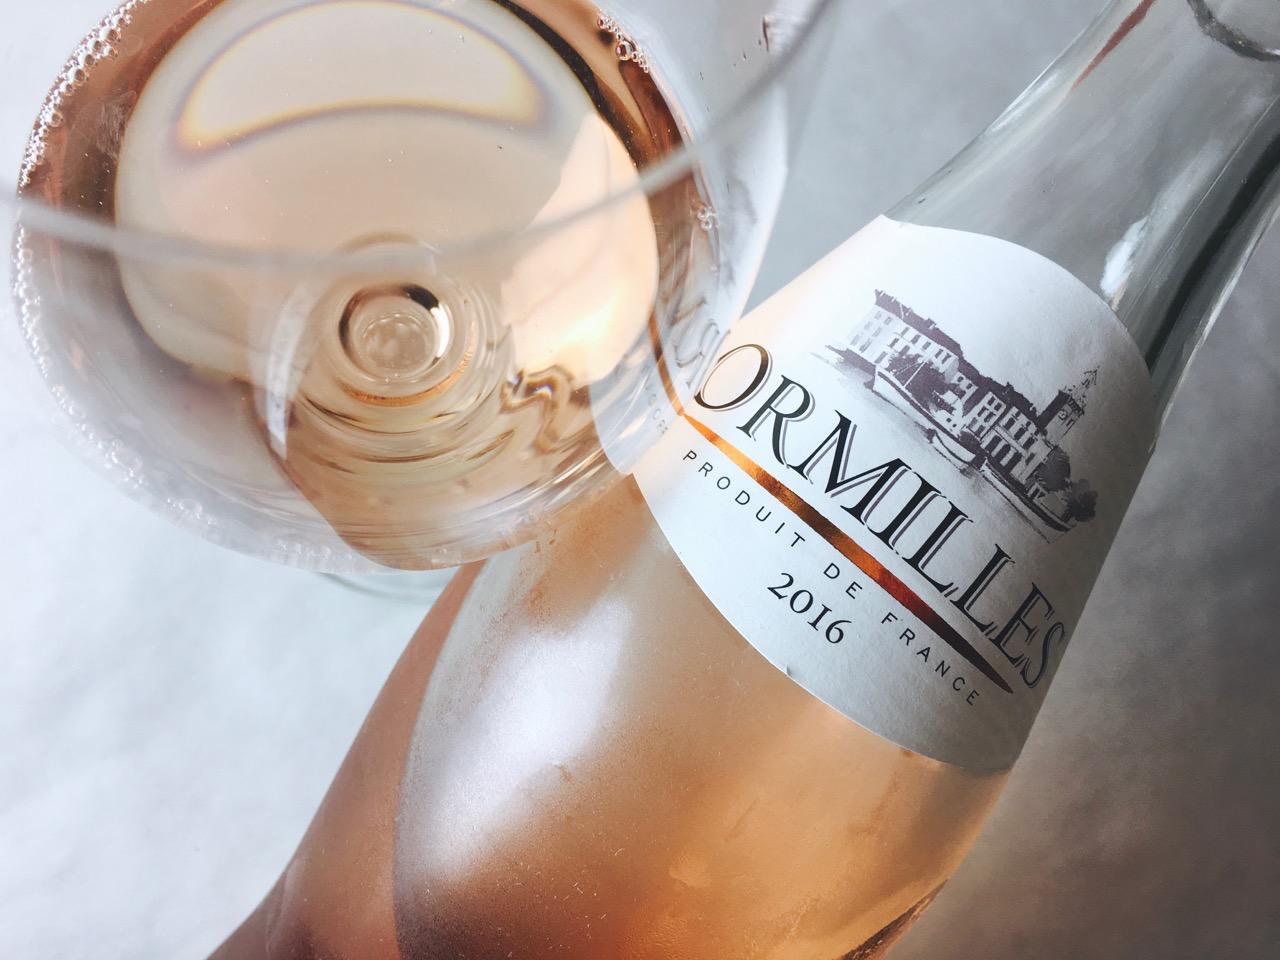 2016 Ormilles Rosé Côtes de Provence